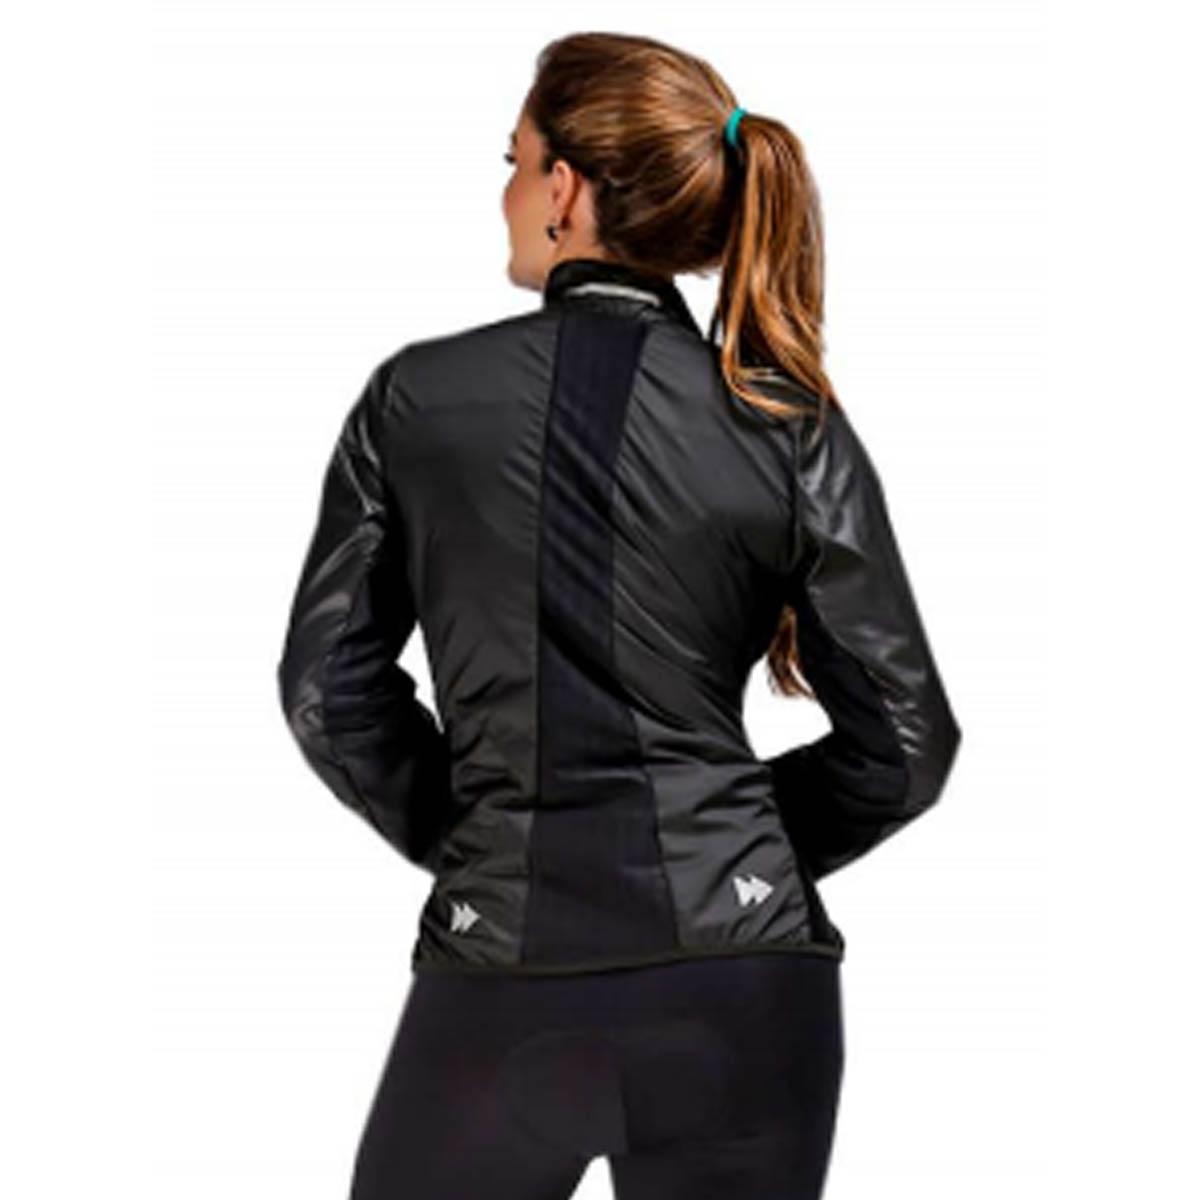 Jaqueta Corta Vento Lynce Feminina Black Titanium com Ziper Refletivo Preta Ciclismo